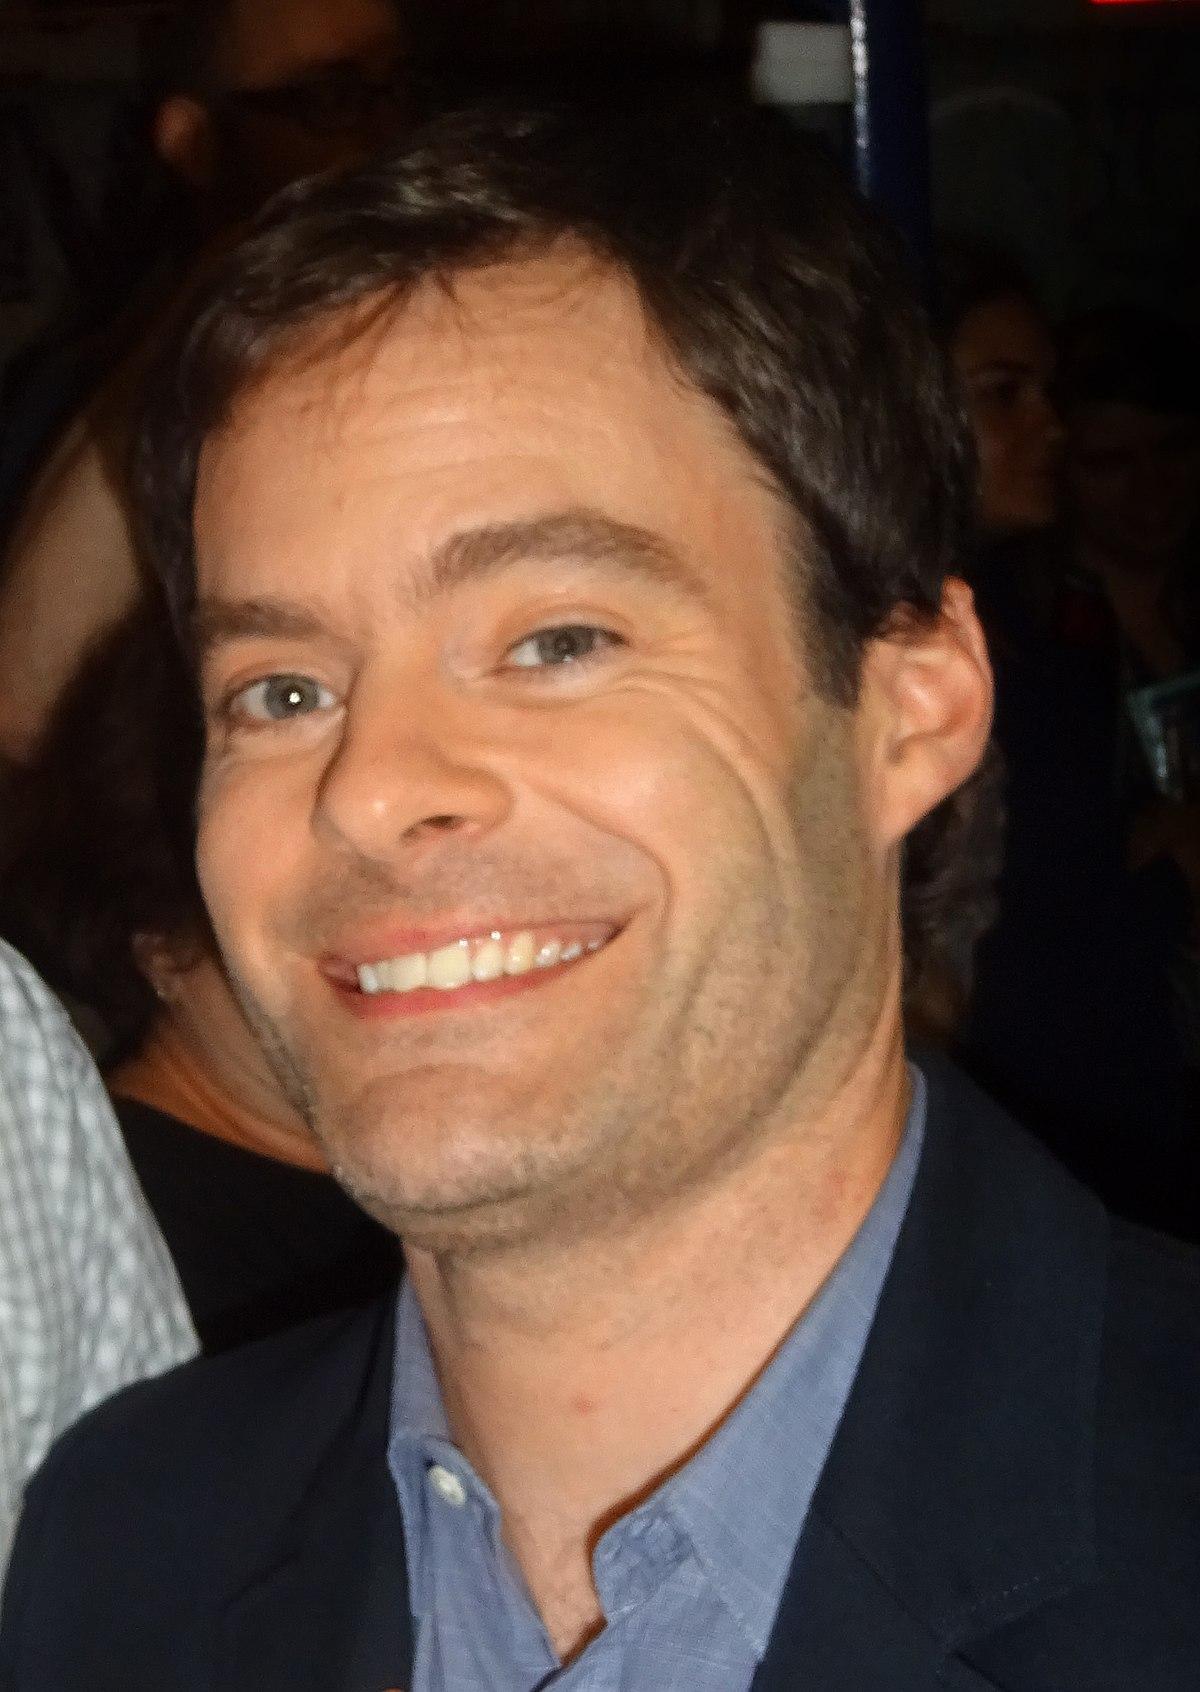 Bill Hader - Wikipedia